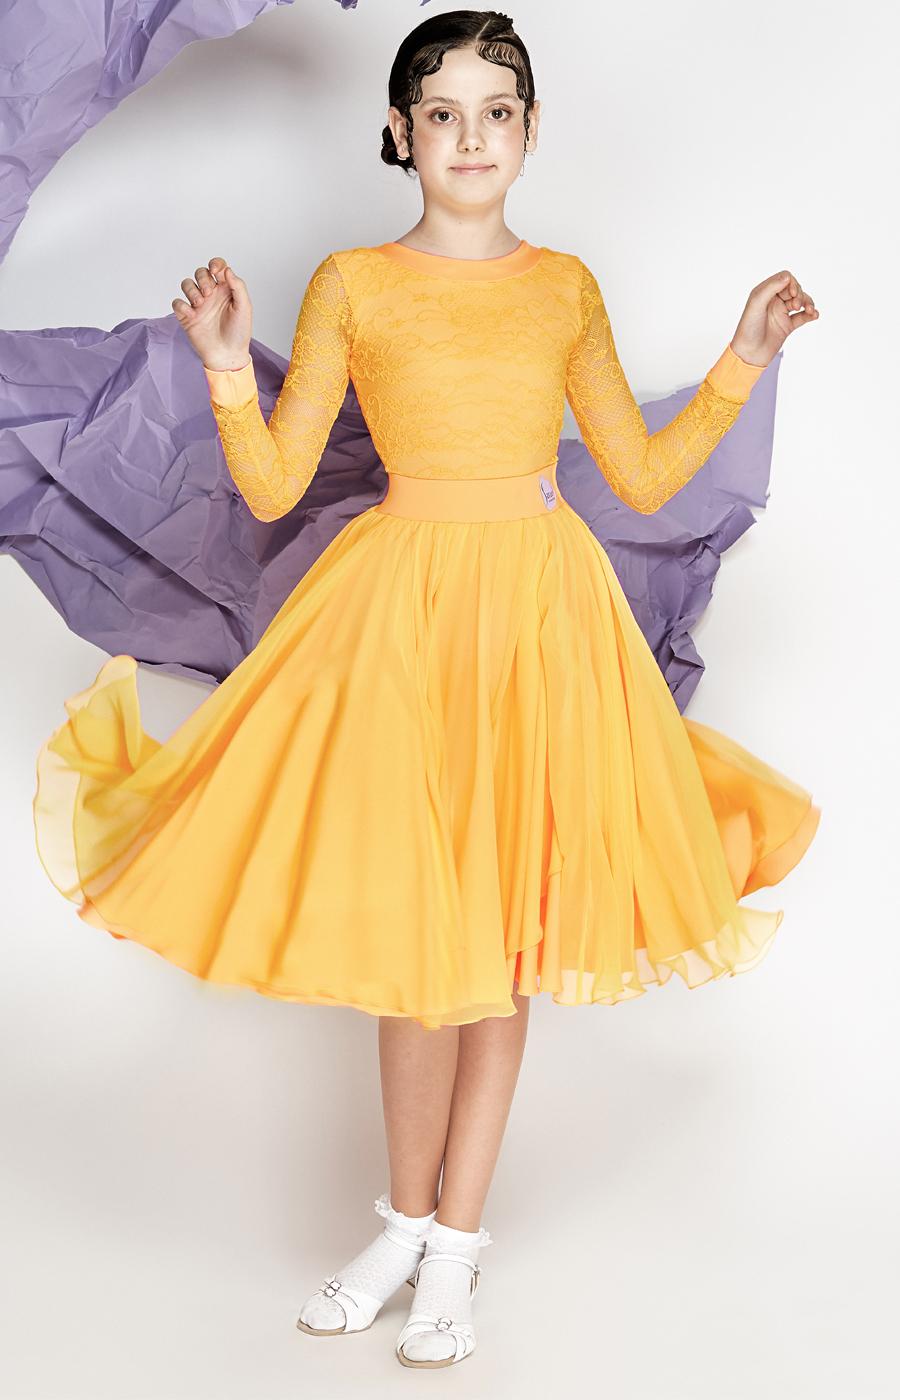 Annabelle juvenile dress